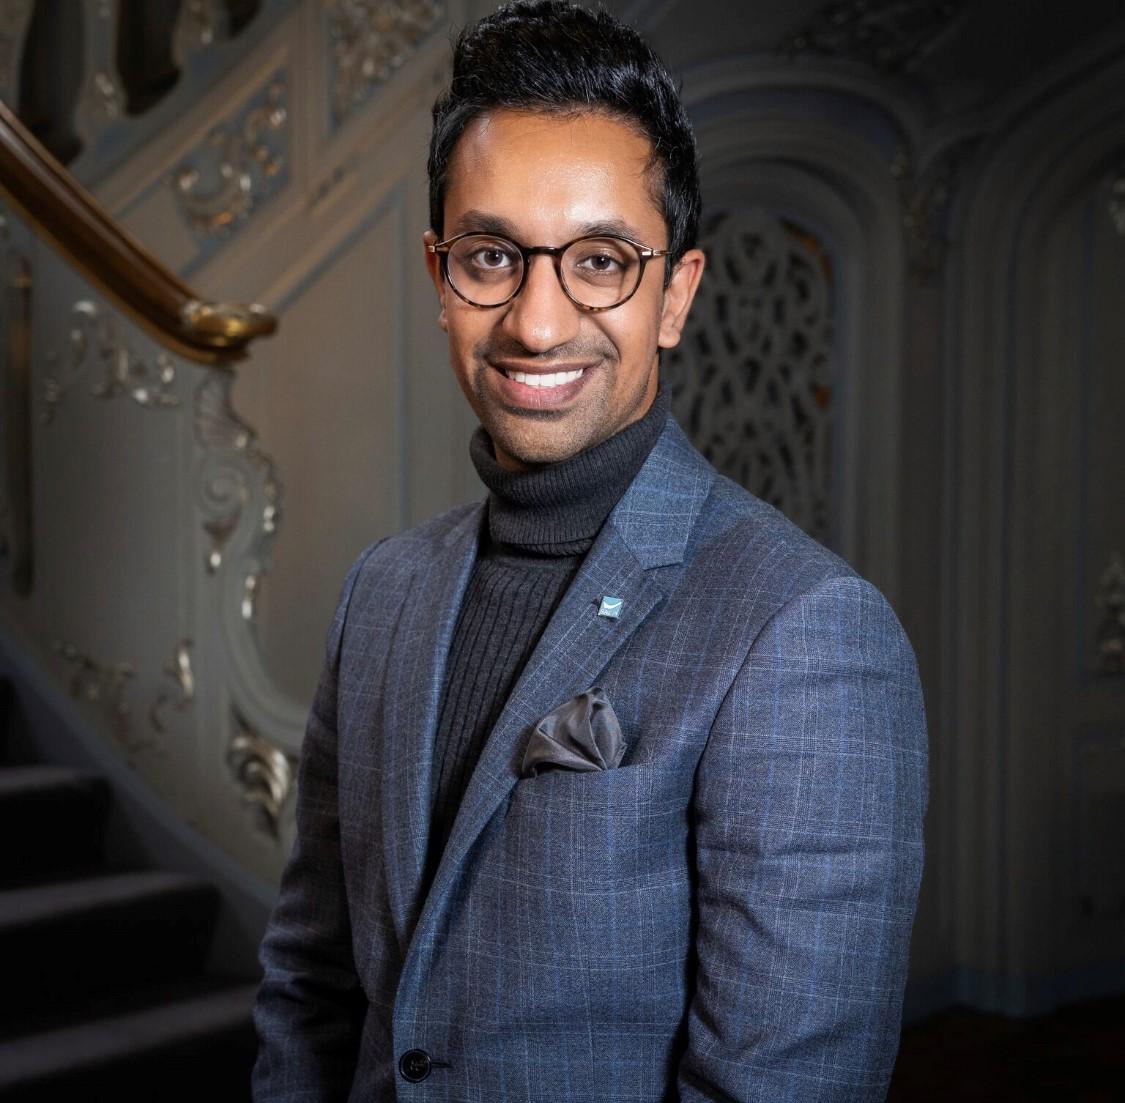 Dr Sam Jethwa